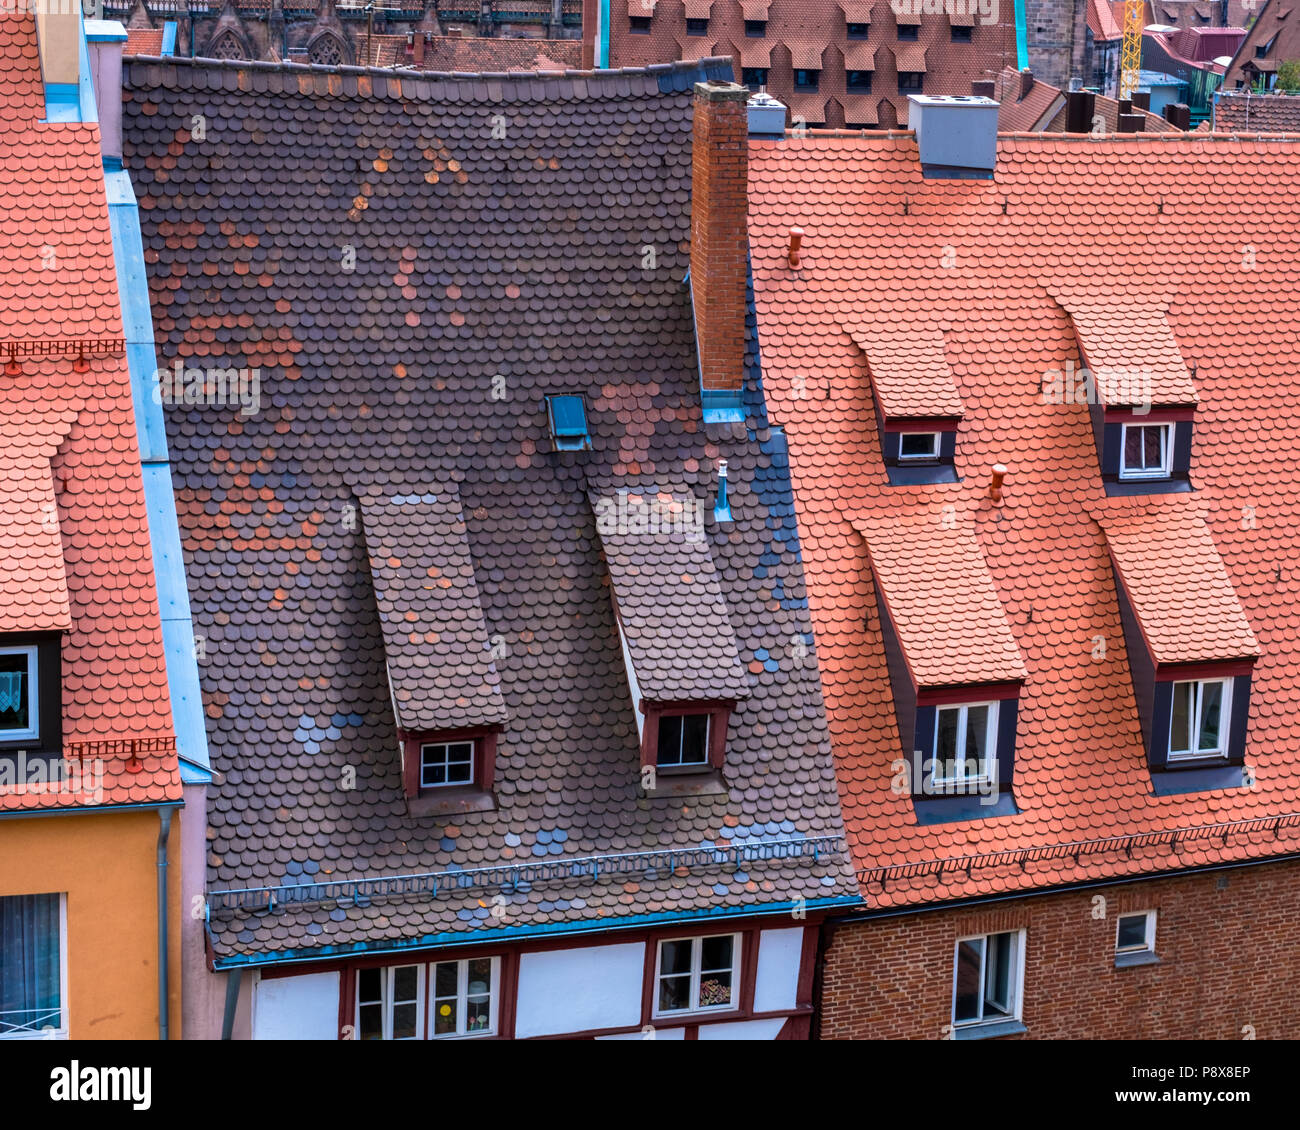 Historische Dächer in der Nürnberger Altstadt, Deutschland Stockbild